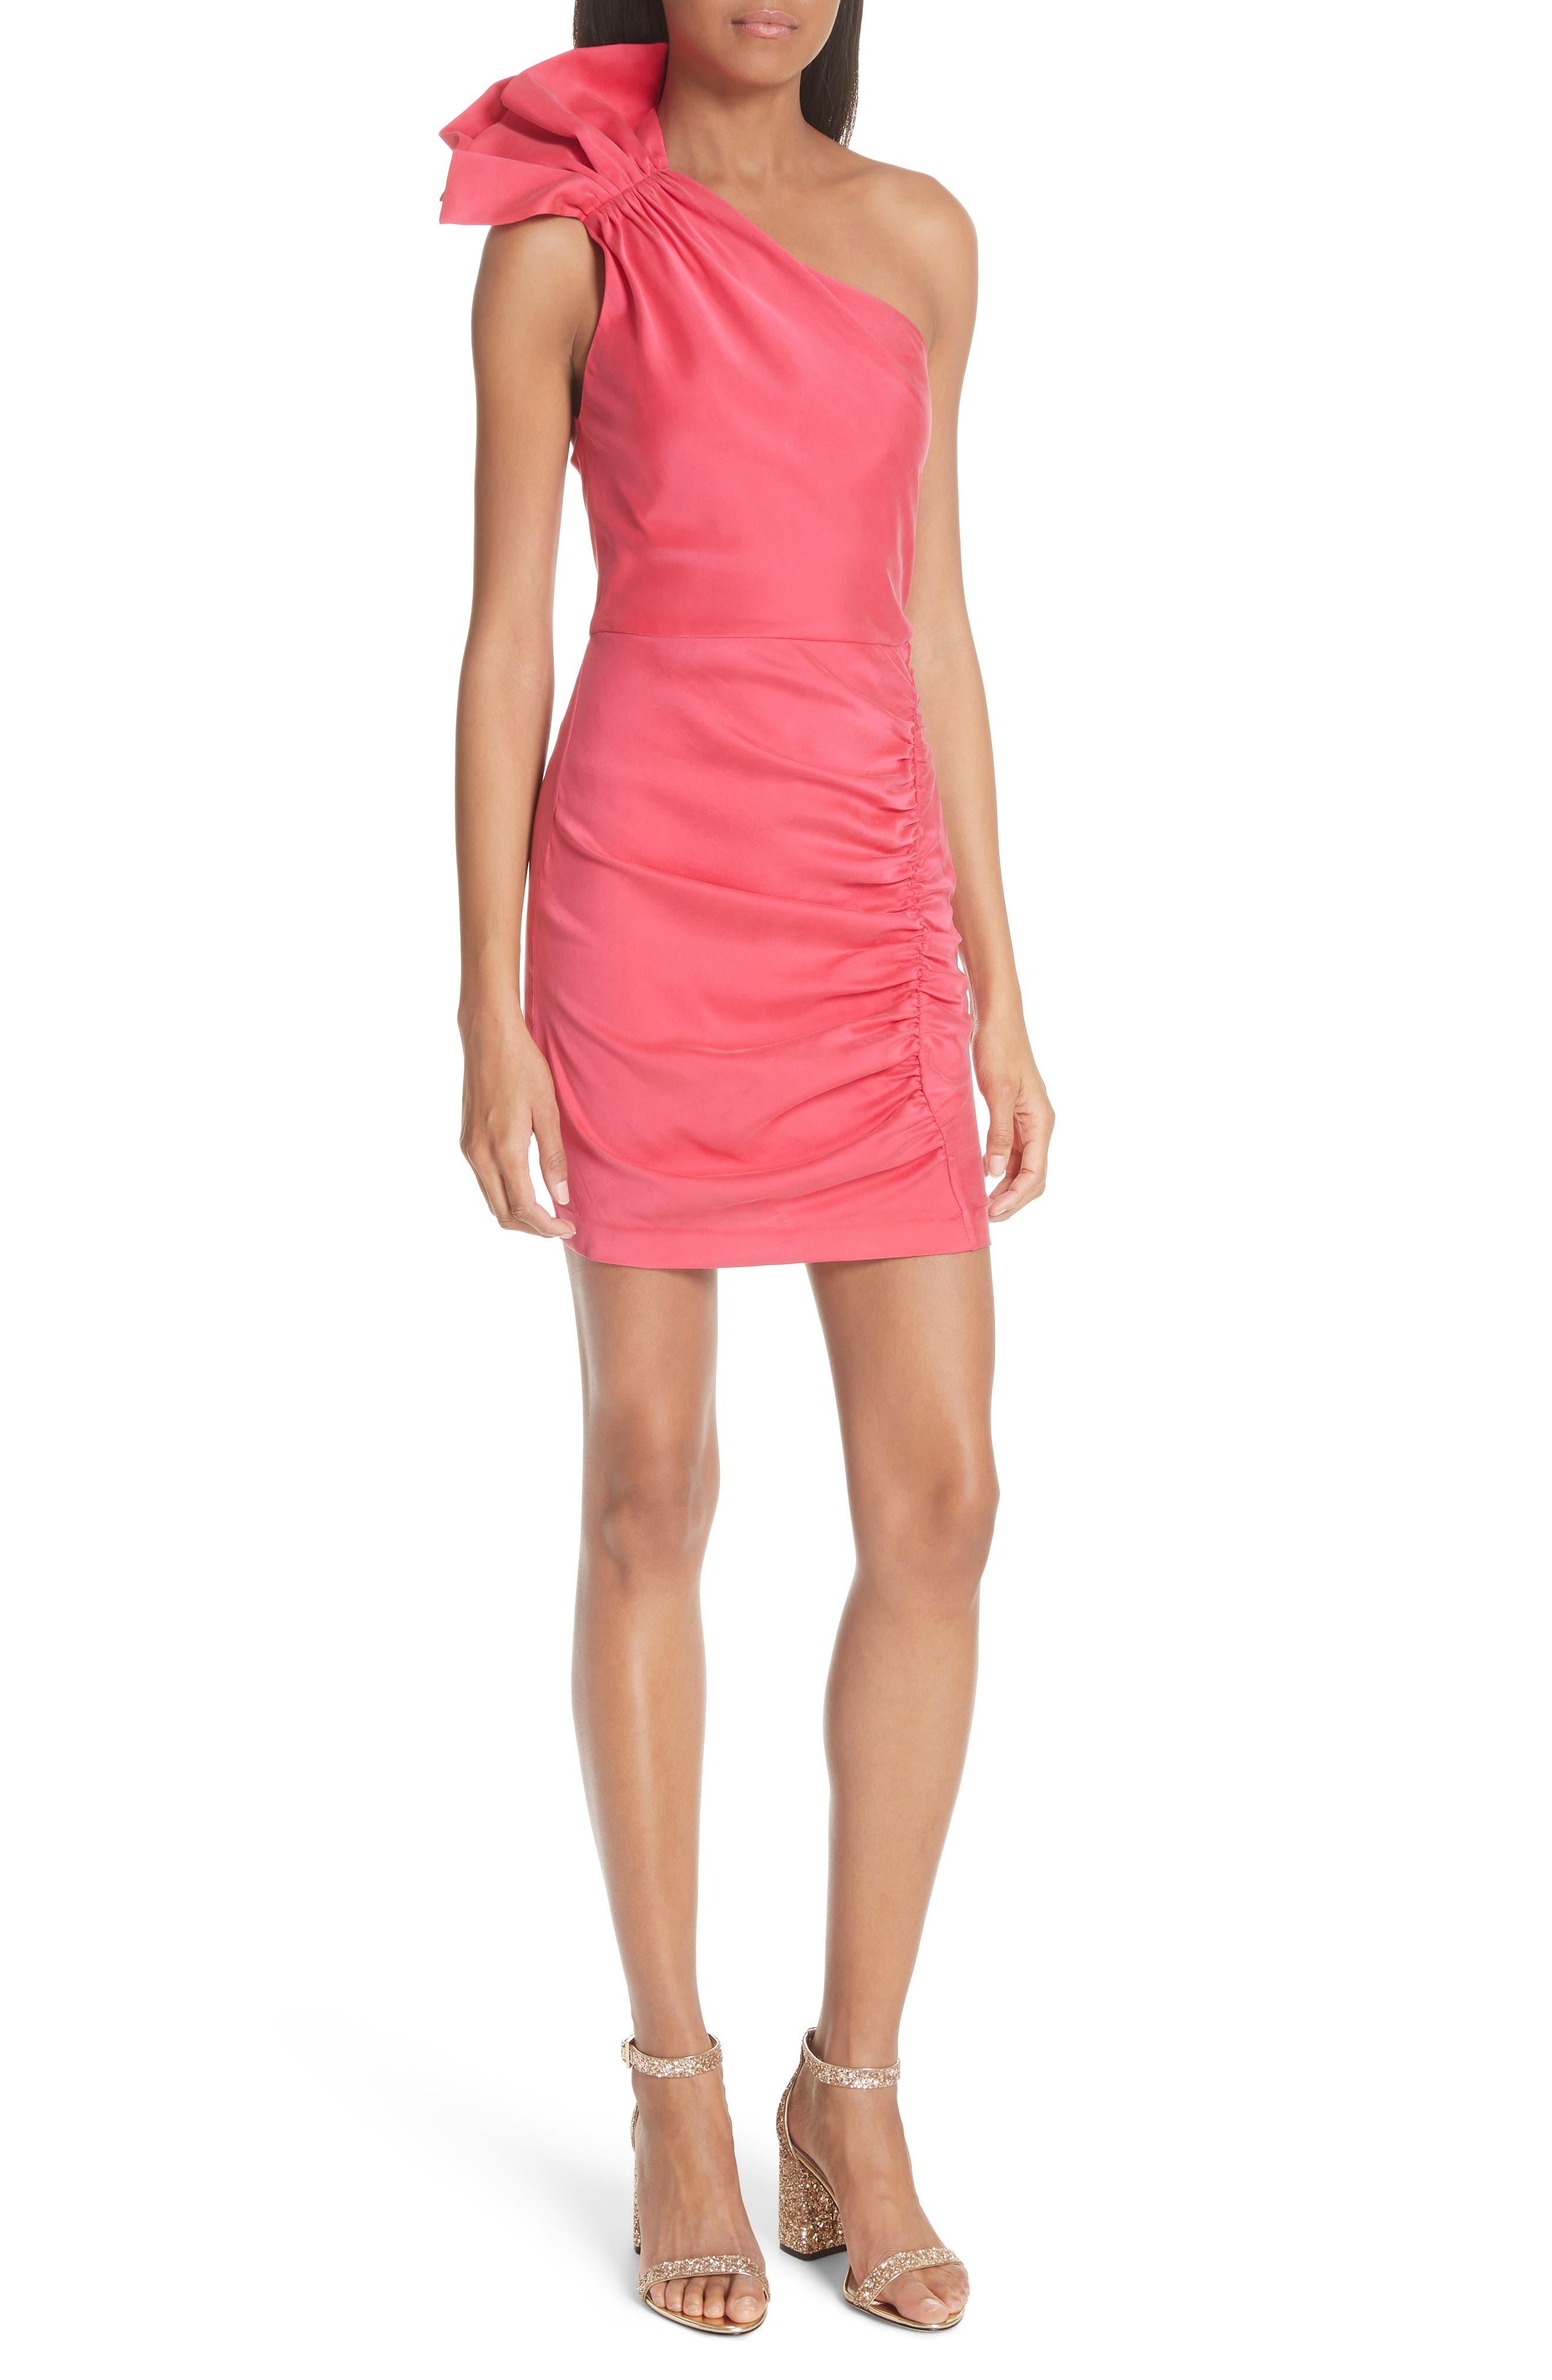 Alice + Olivia Malita One-Shoulder Fitted Mini Dress